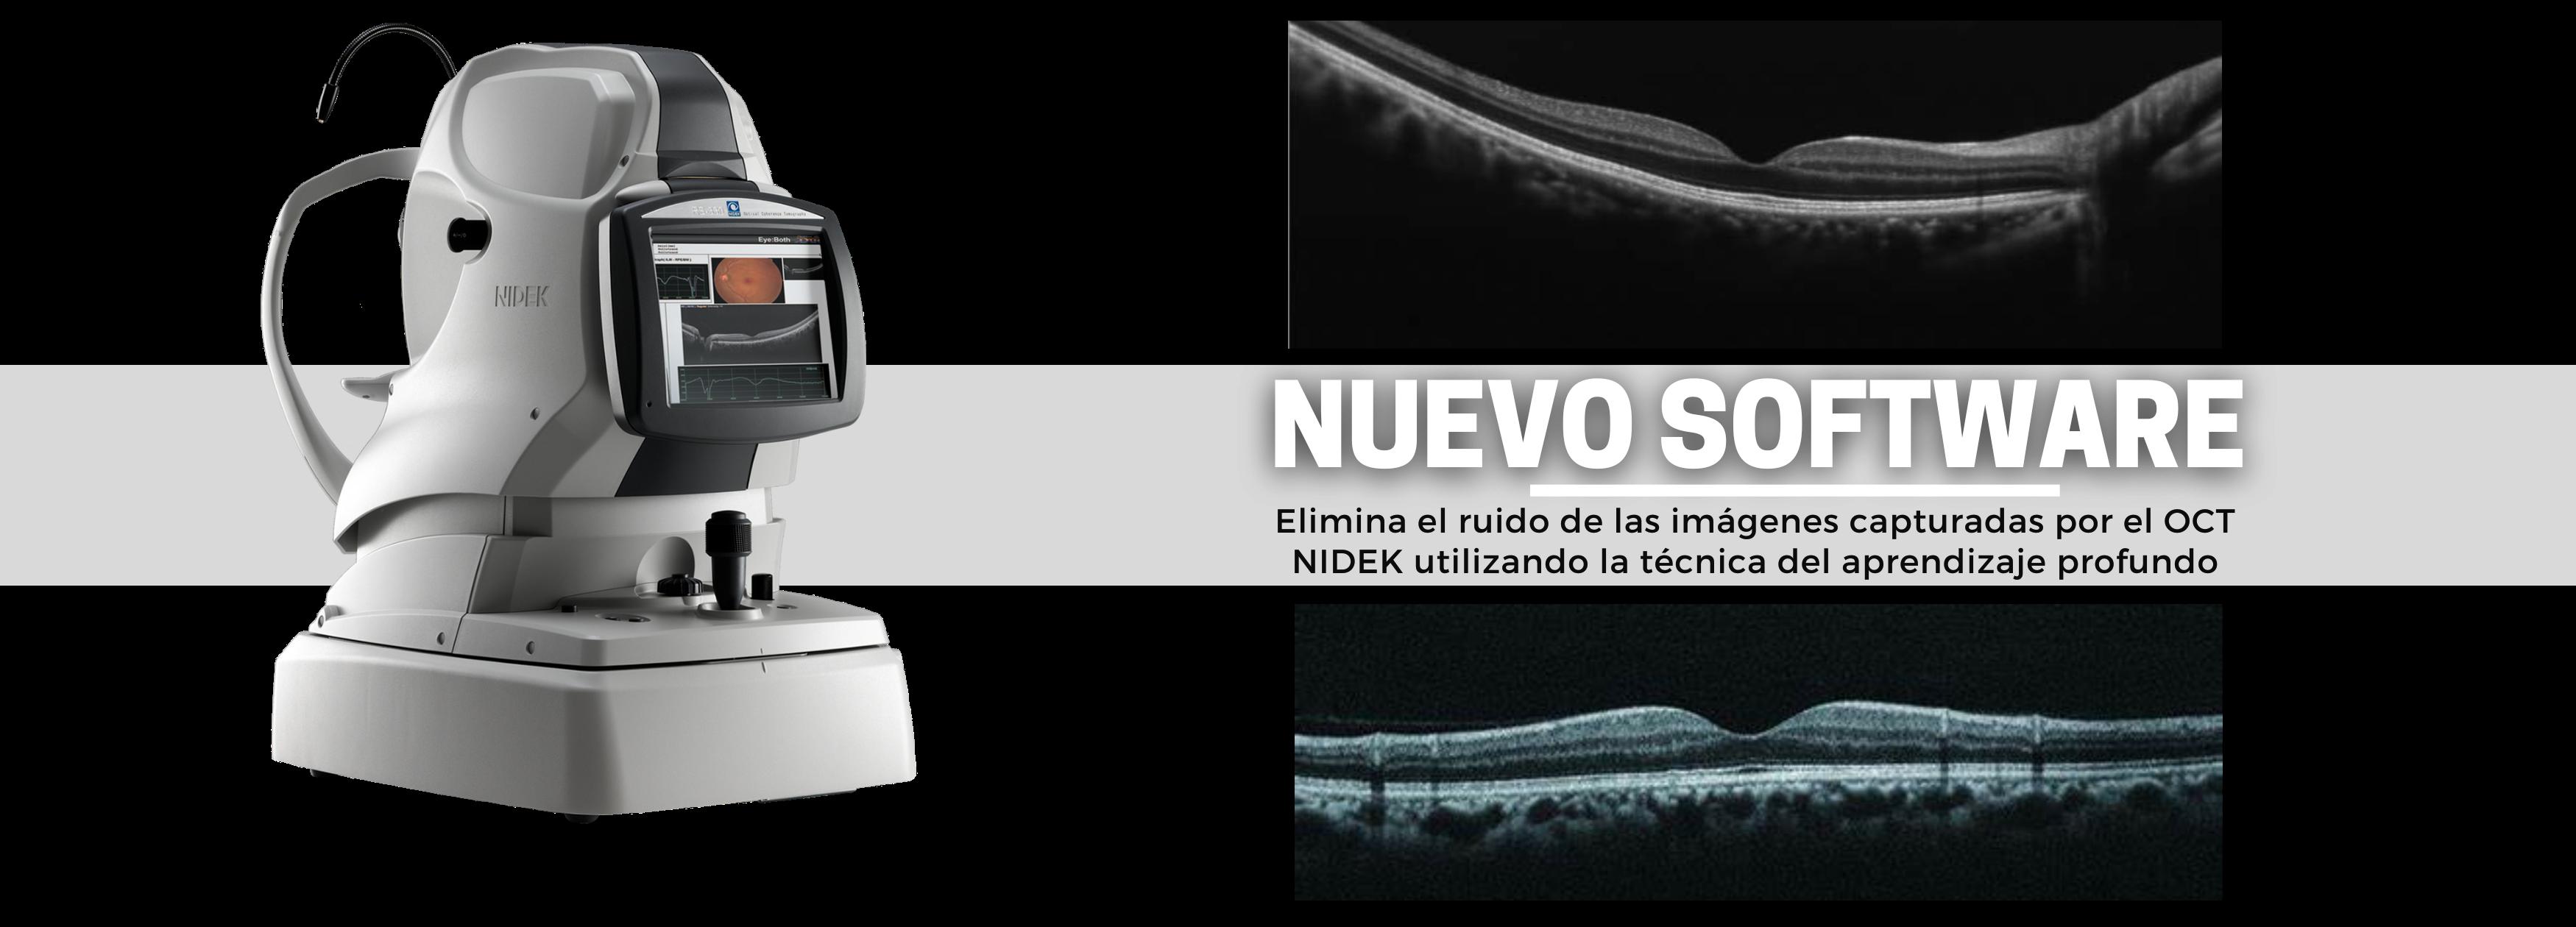 Copy of nuevo software.png